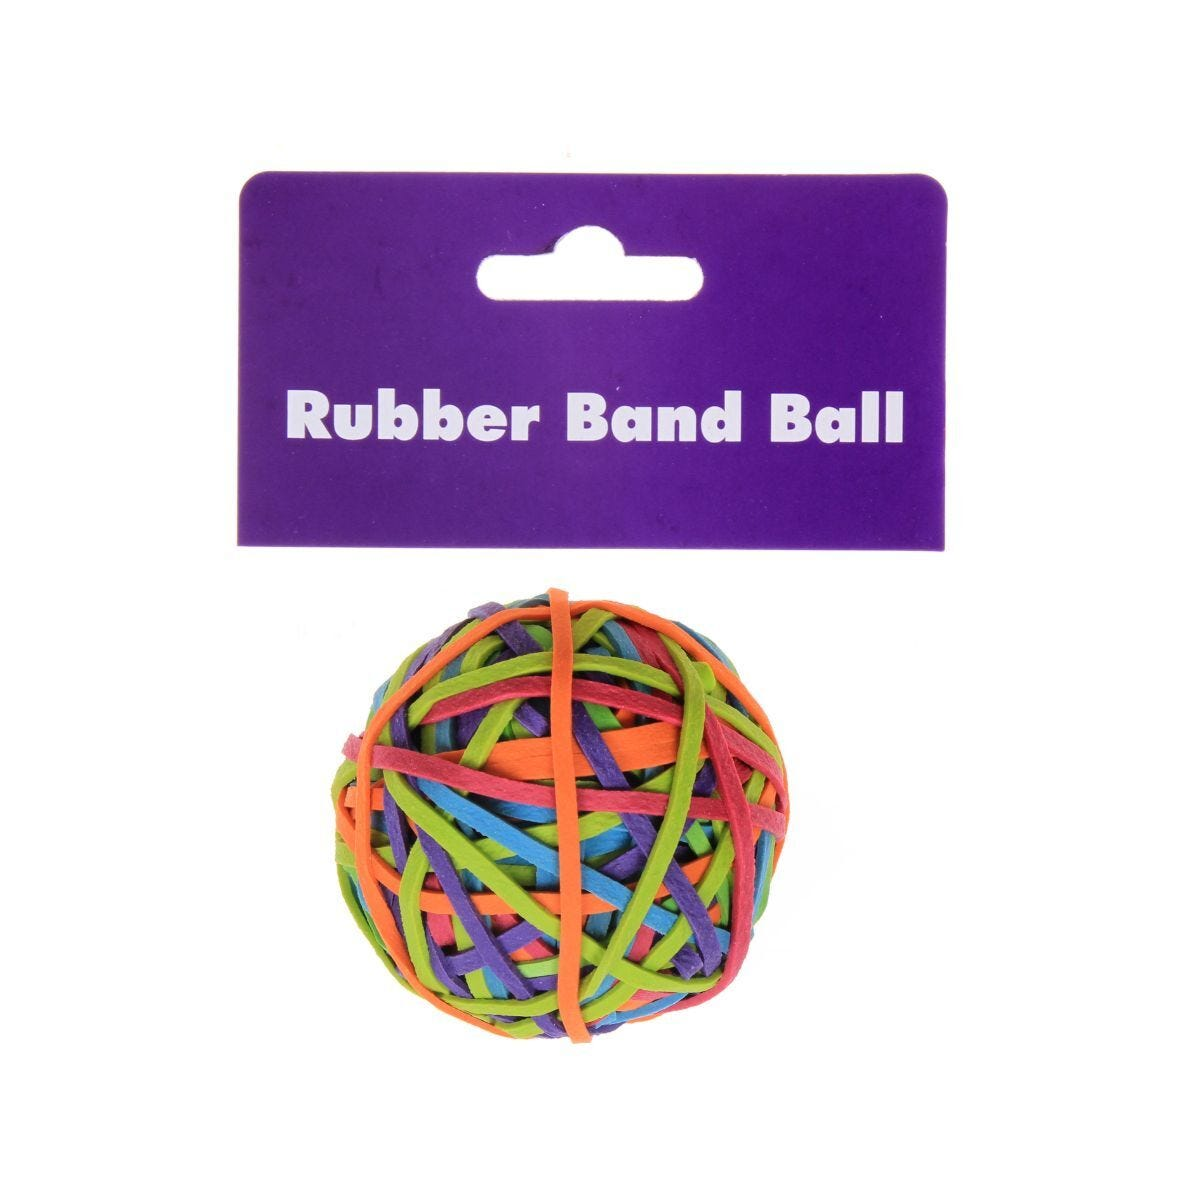 Ryman Rubber Band Ball 113g